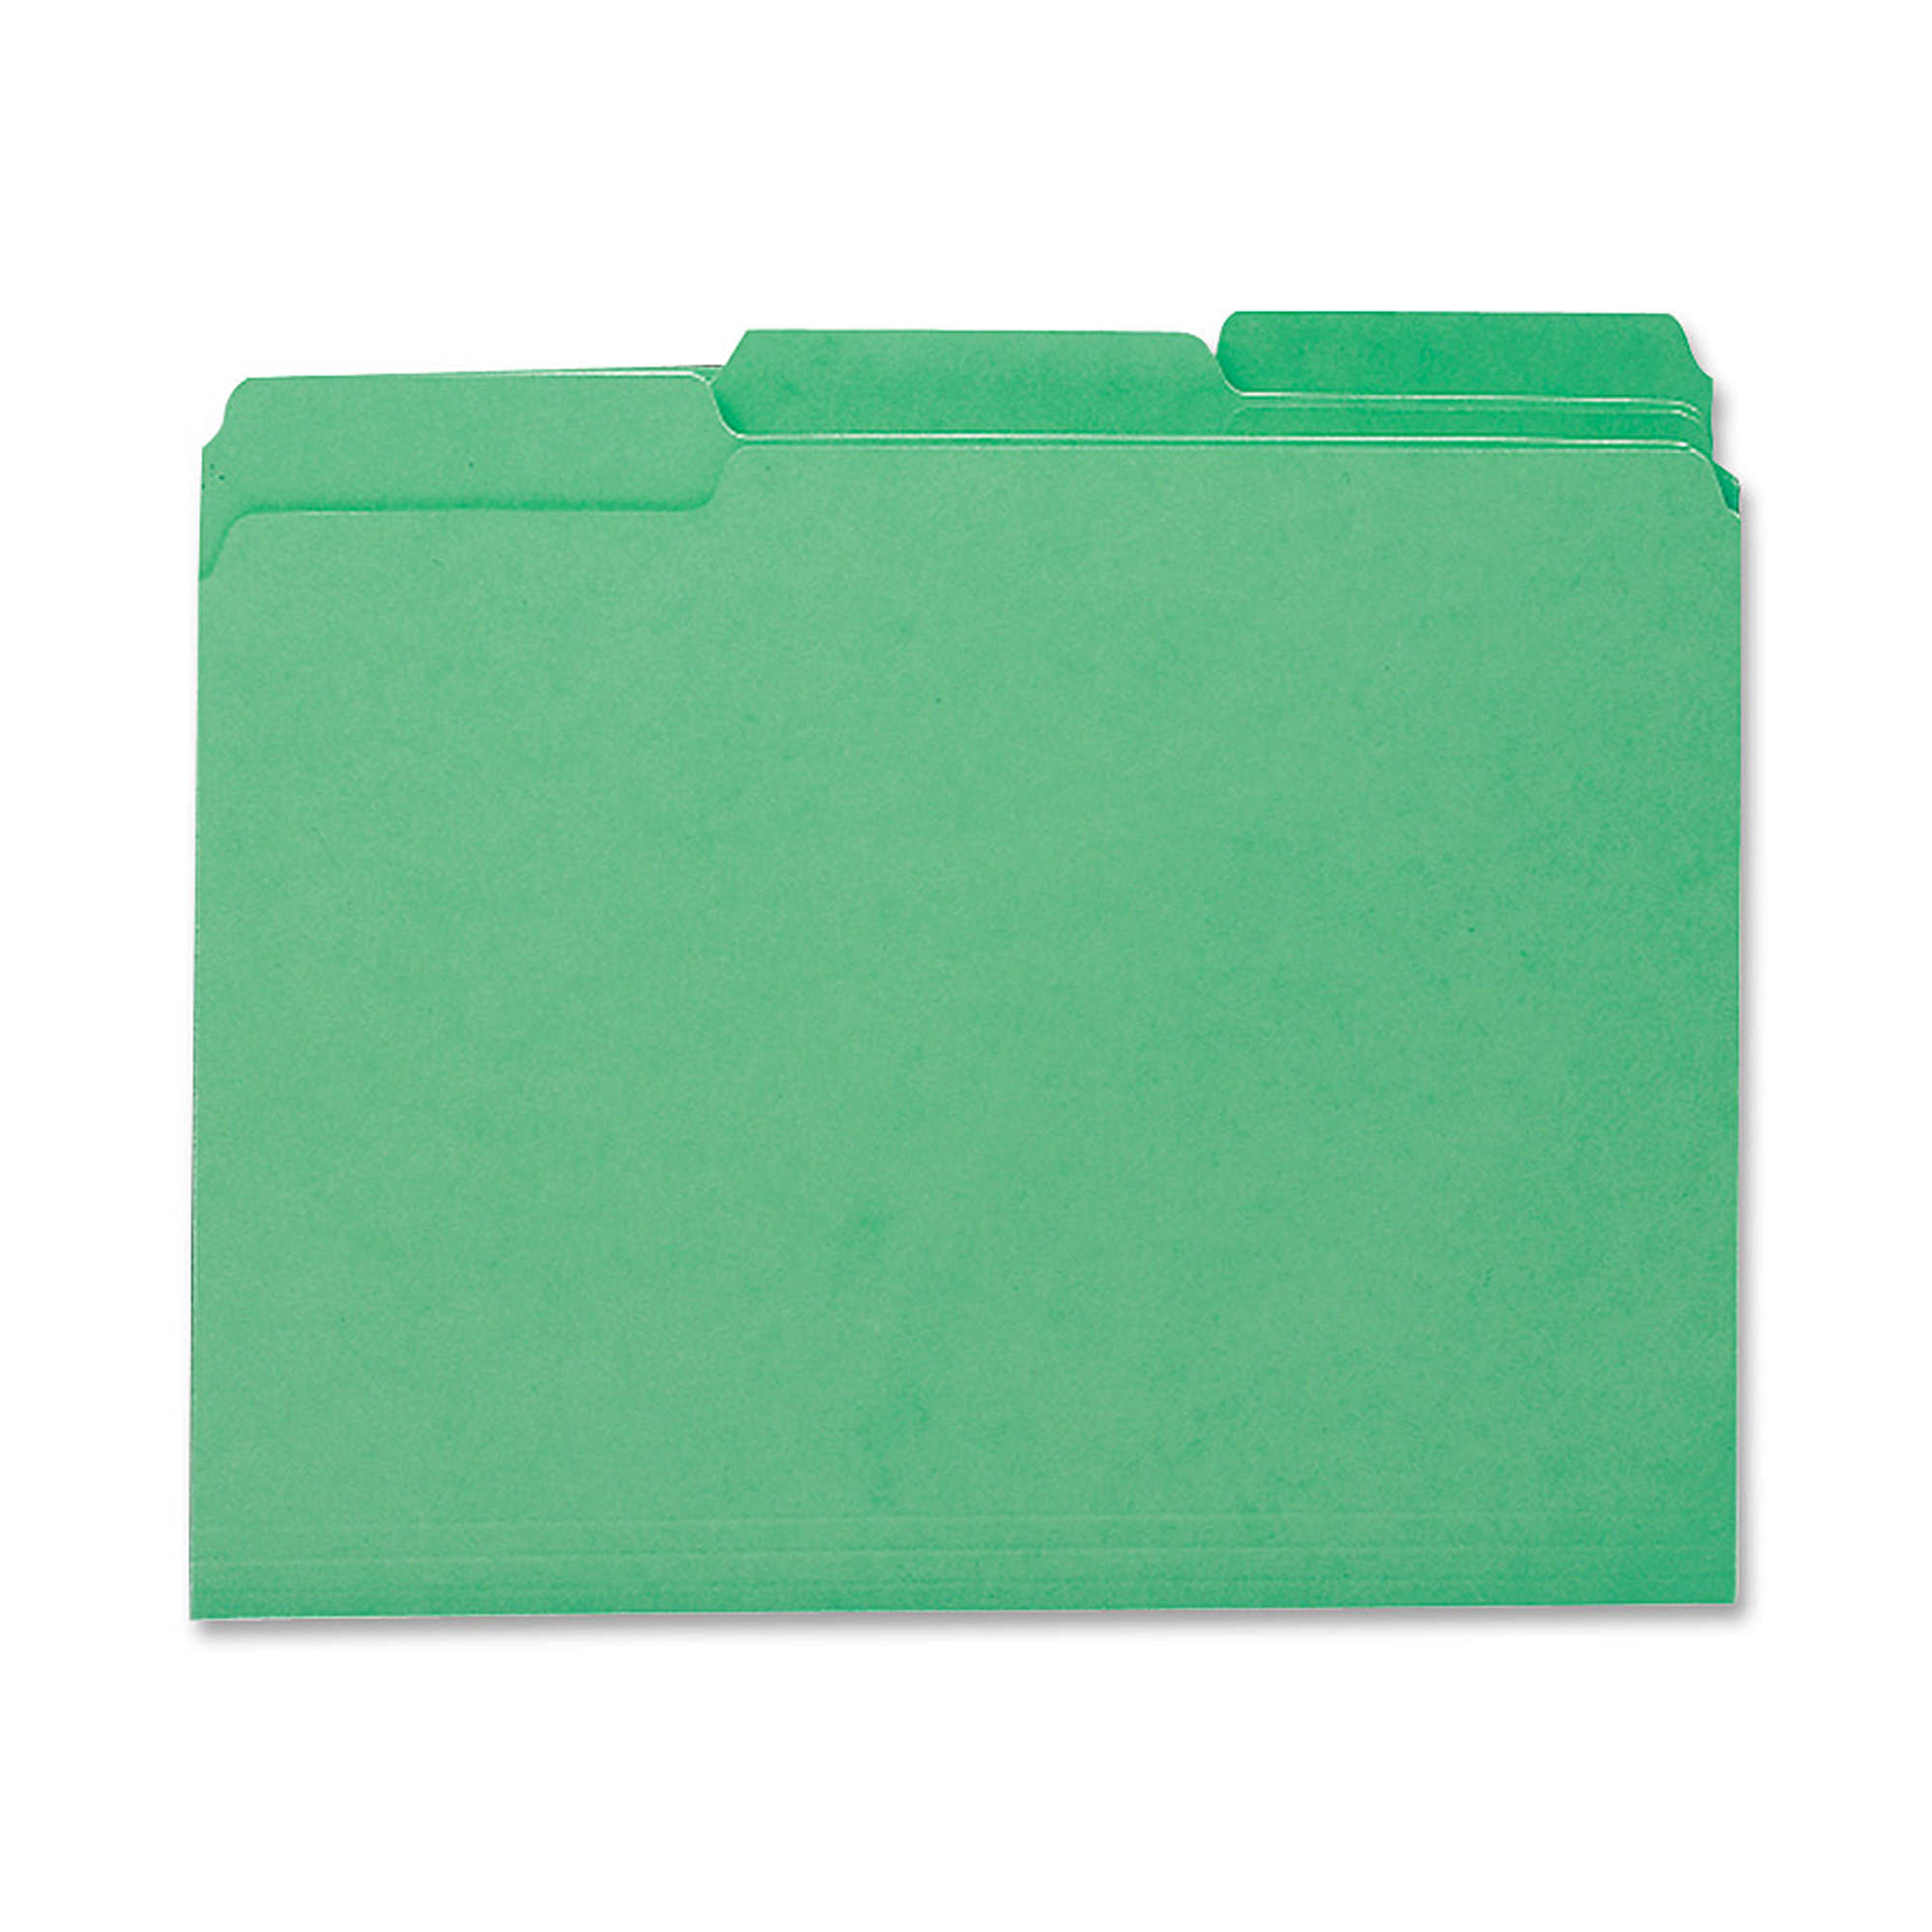 Smead® 1/3-Cut Interior Folders, Letter Size, Green, Box Of 100